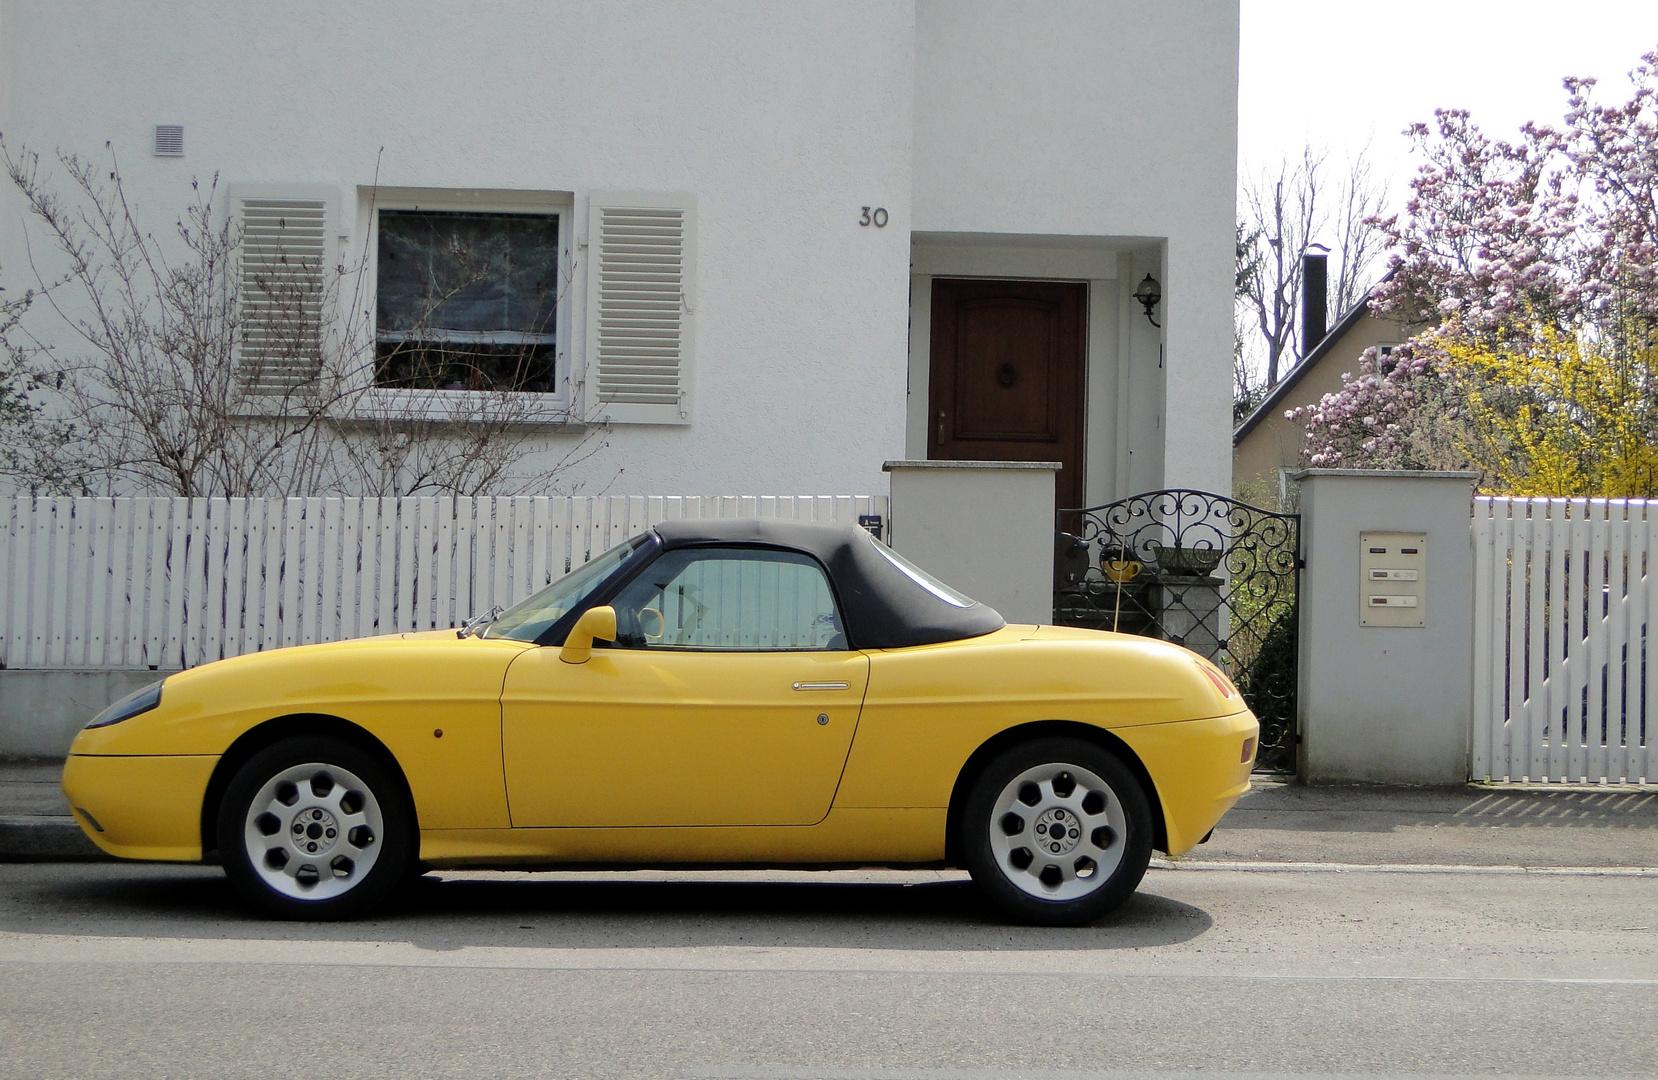 Fiat Barchetta, mal in Gelb...